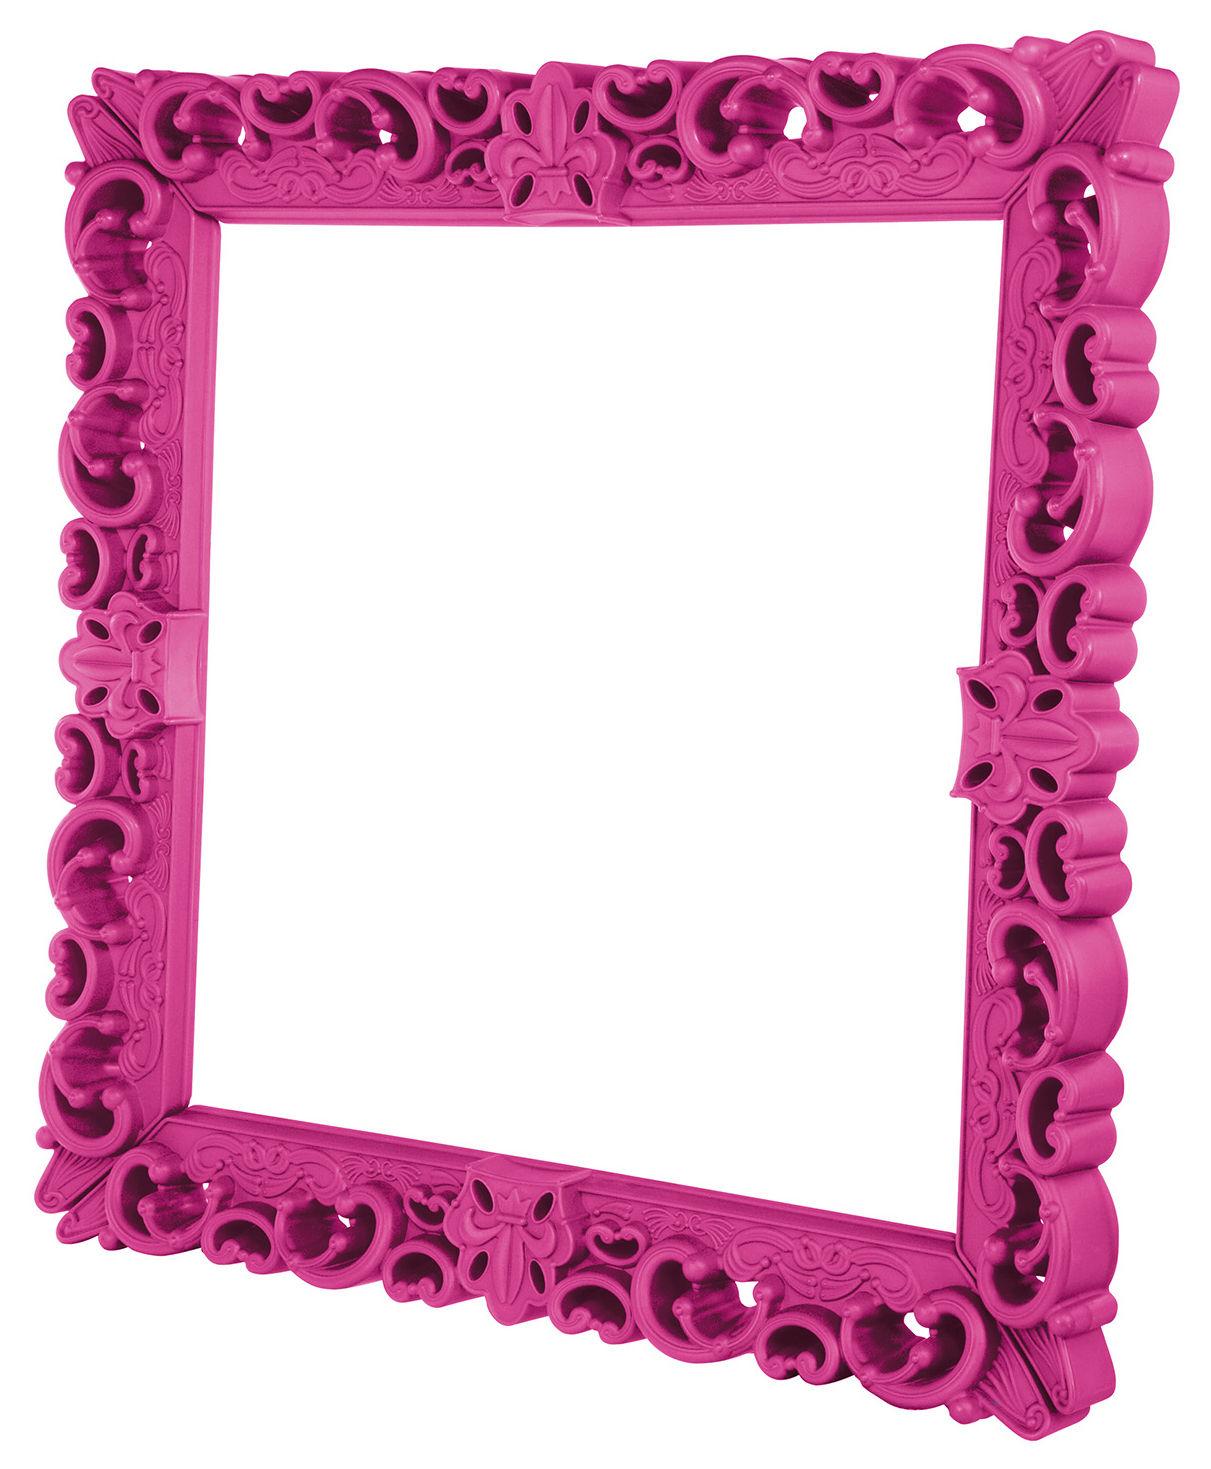 Dekoration - Dekorationsartikel - Frame of Love Rahmen / 153 x 153 cm - Design of Love by Slide - Rosa - rotationsgeformtes Polyäthylen